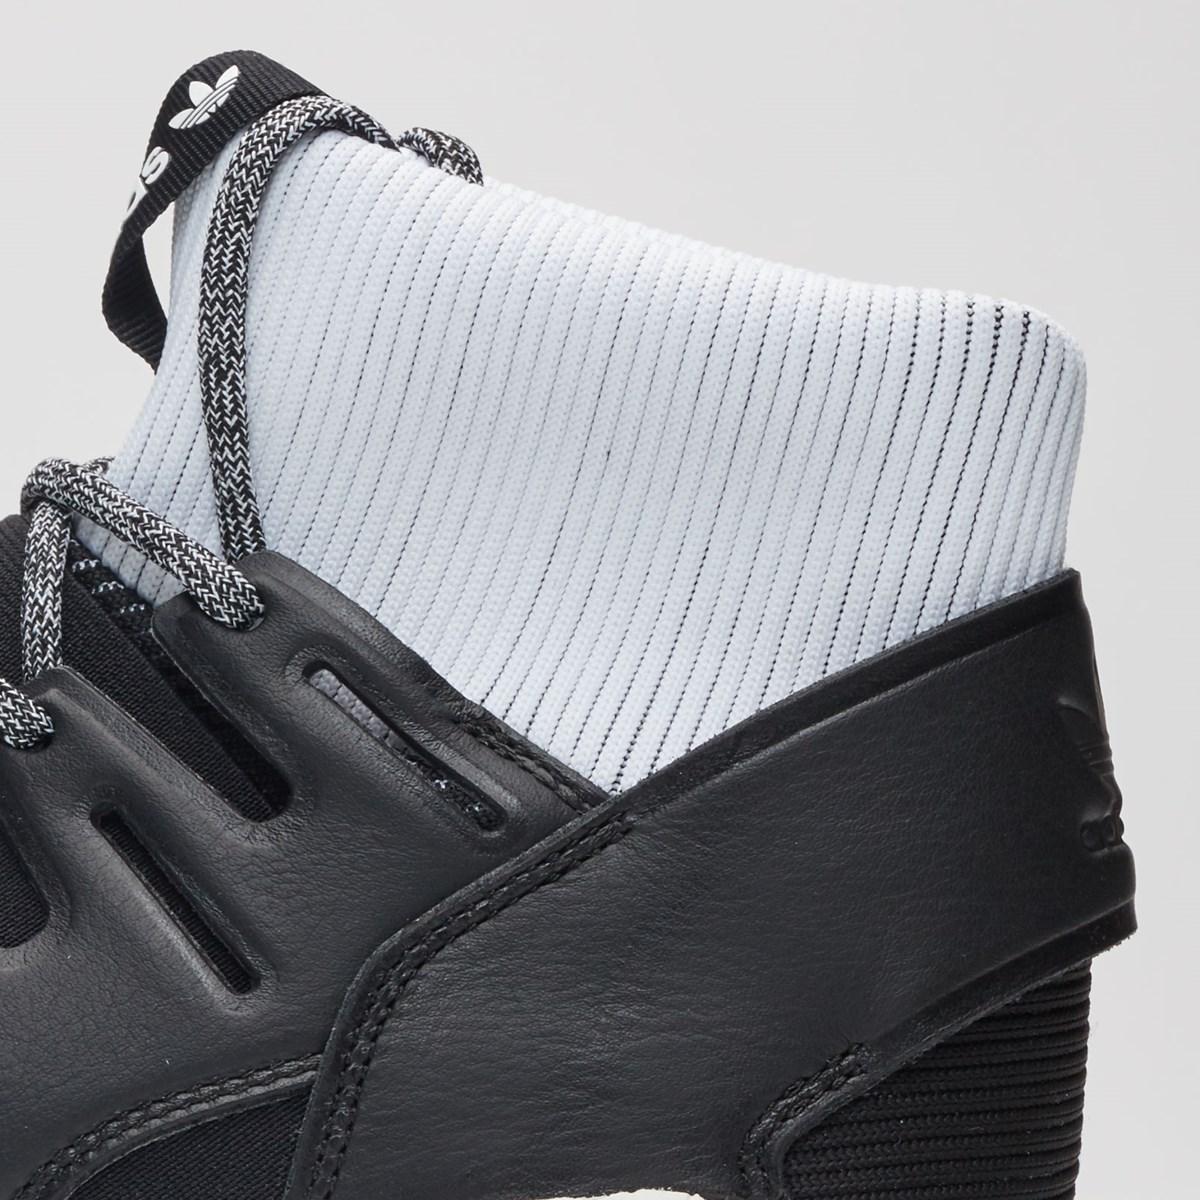 brand new afec6 b9285 adidas Tubular Doom - Ba7555 - Sneakersnstuff | sneakers ...